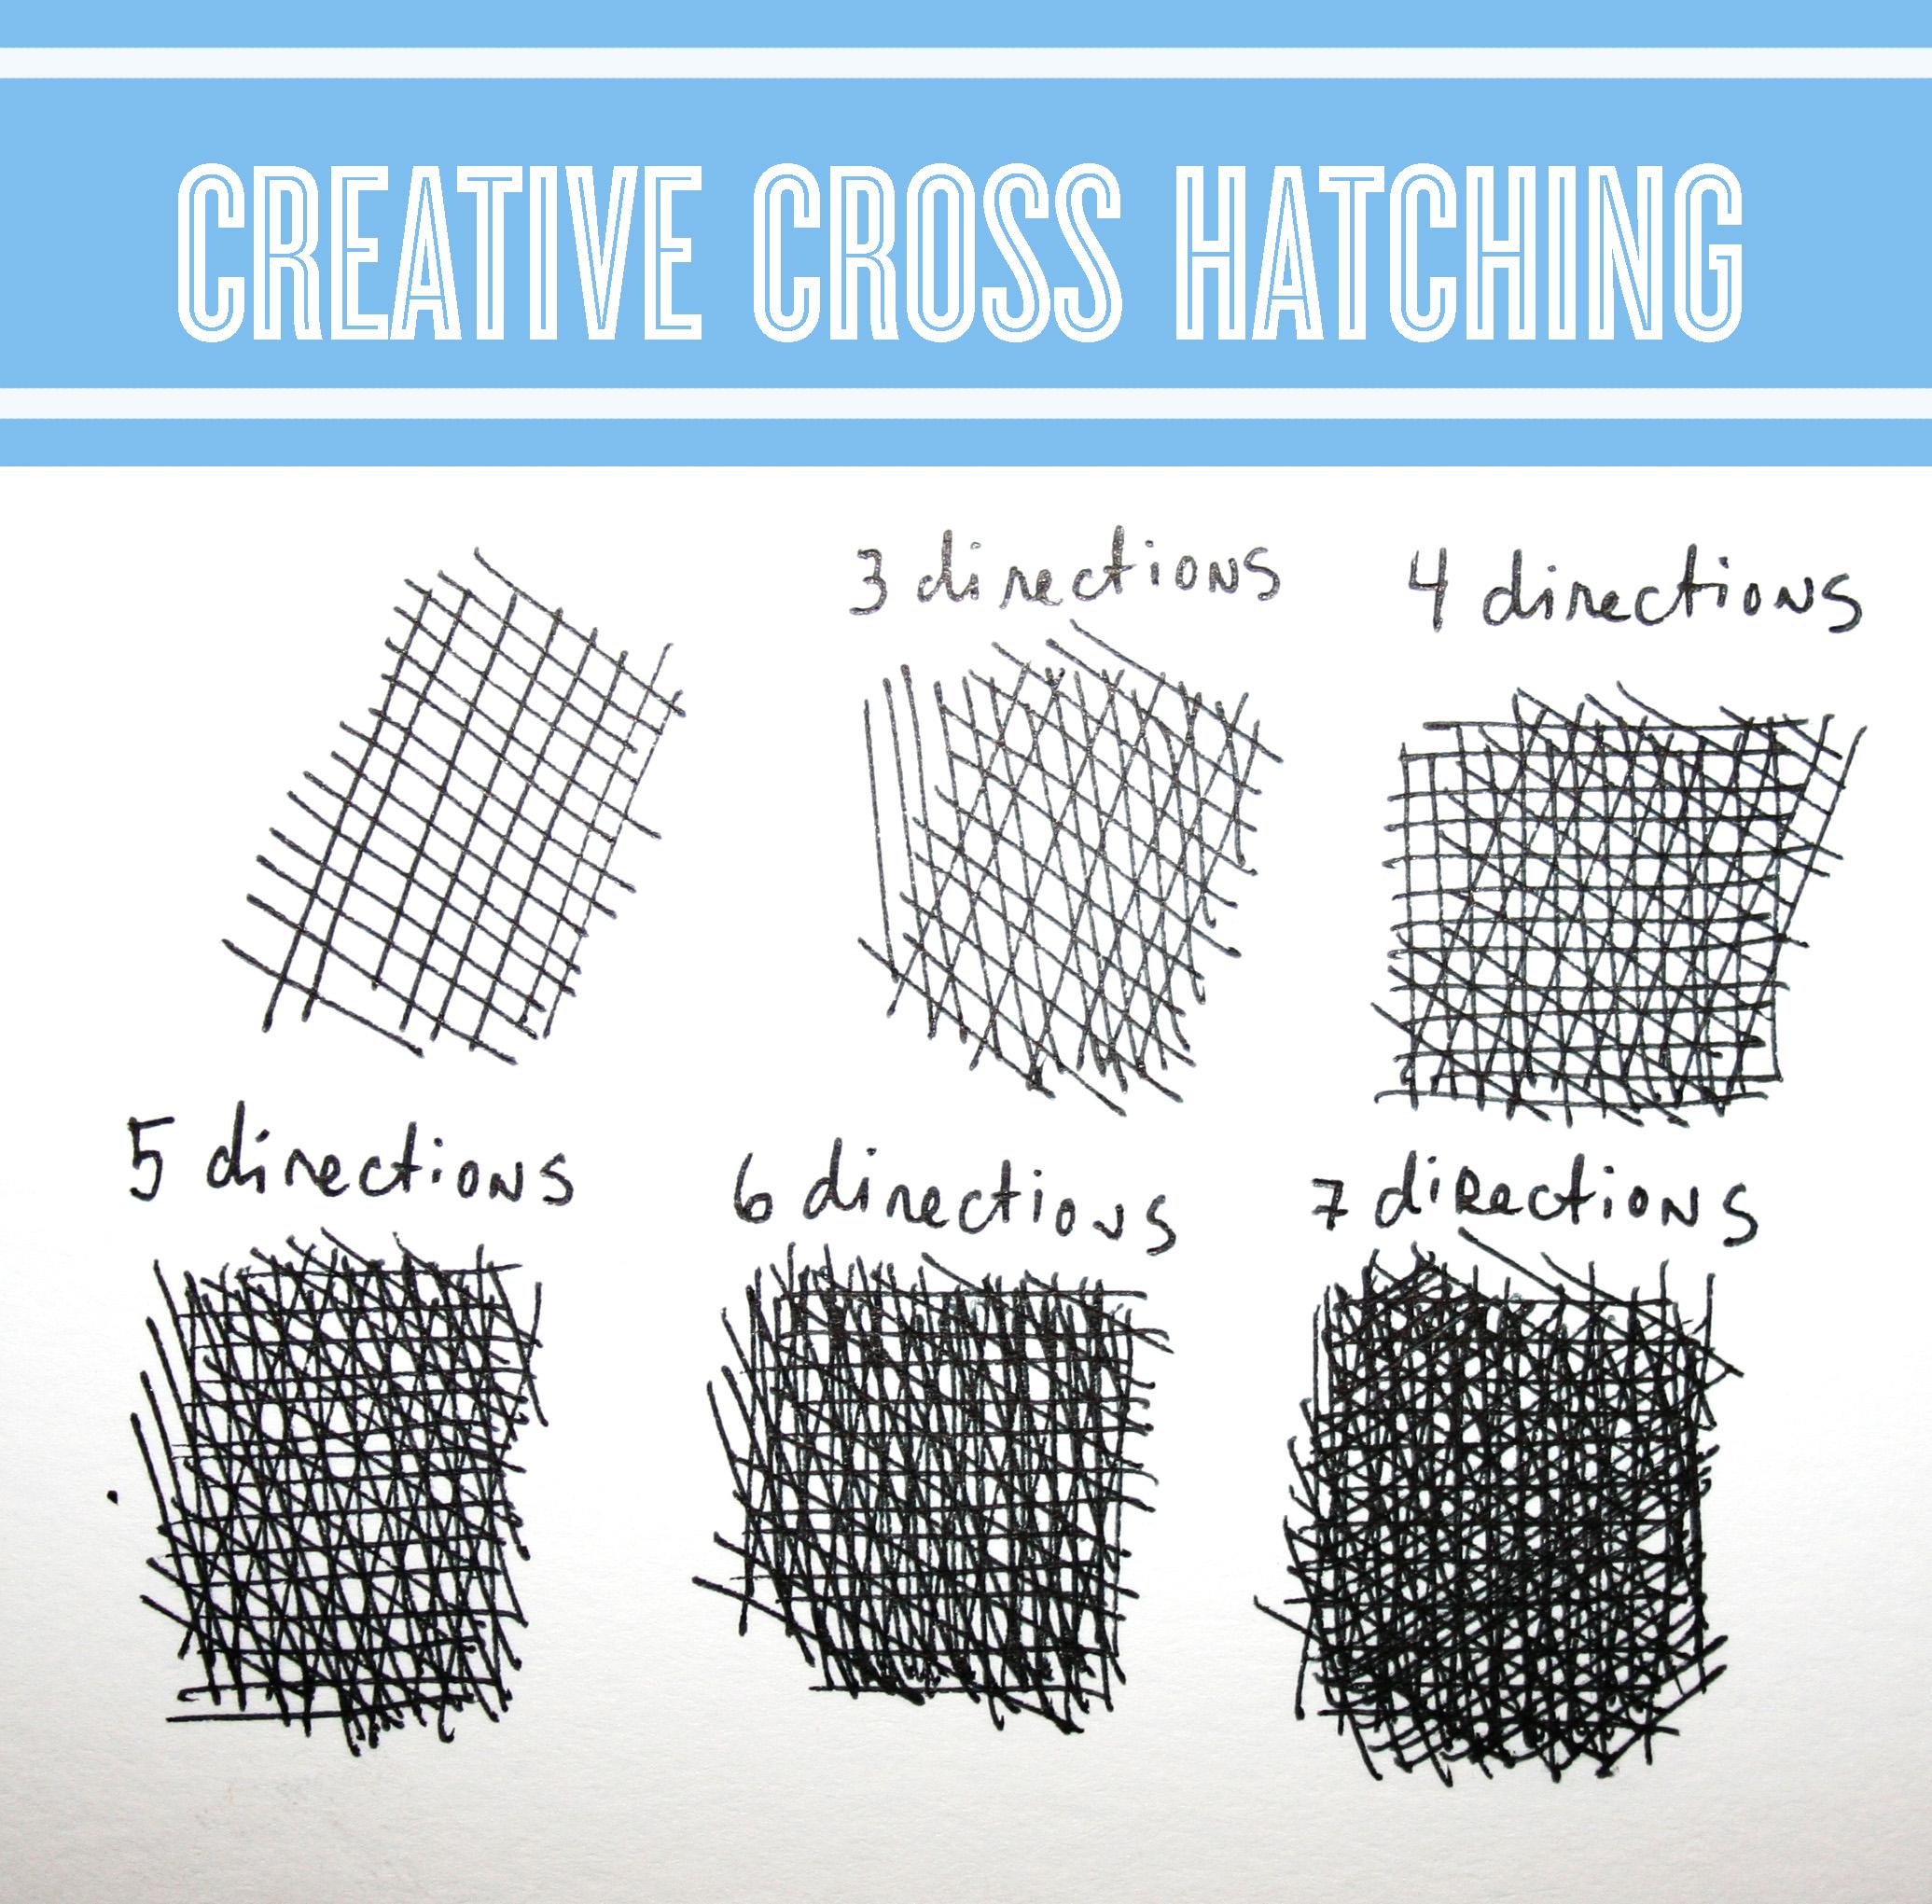 Creative cross hatching